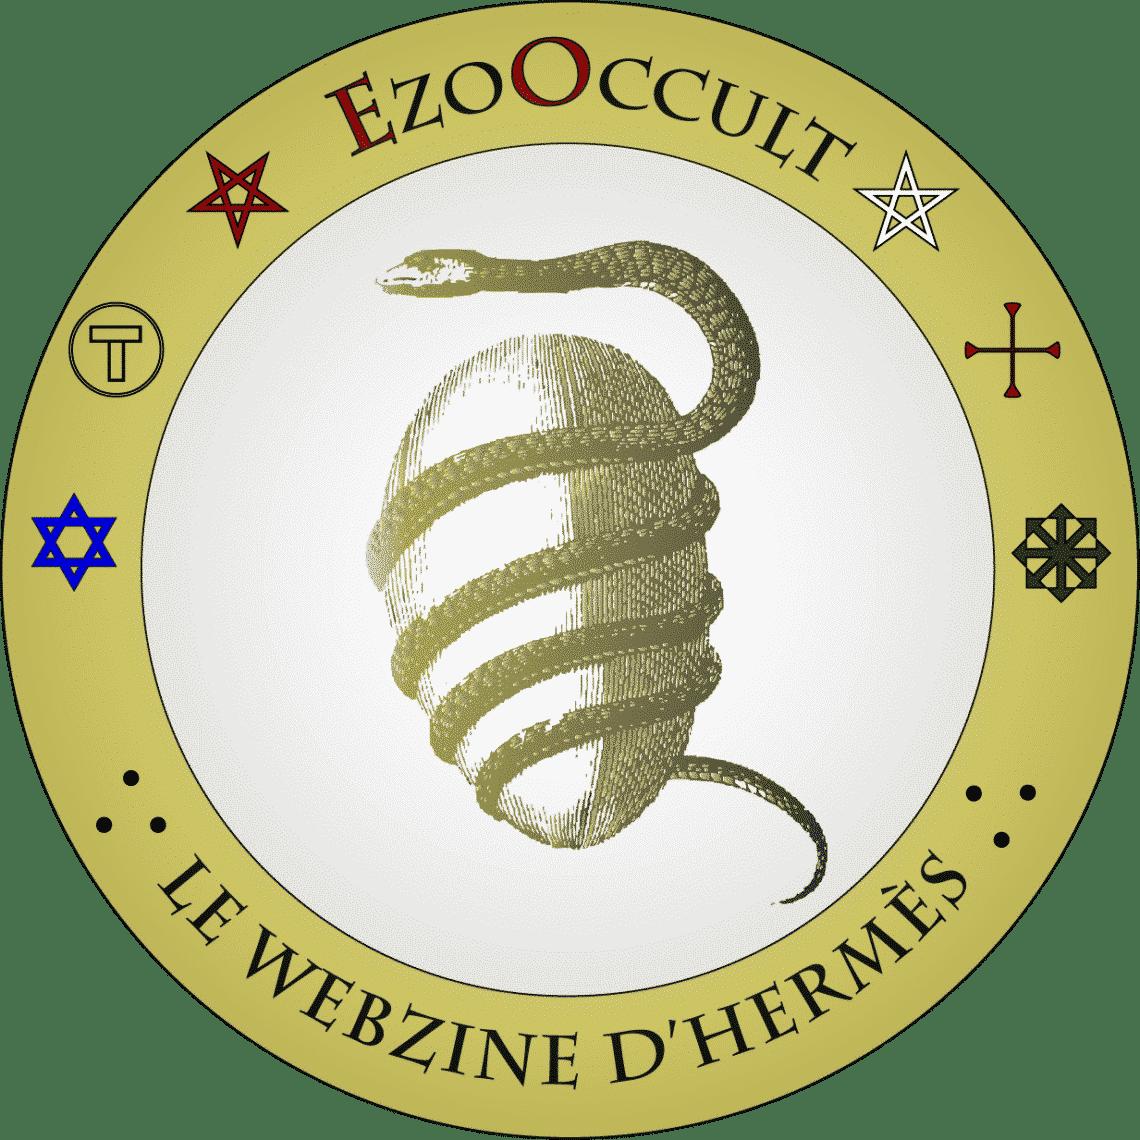 A propos EzoOccult webzine d'Hermès